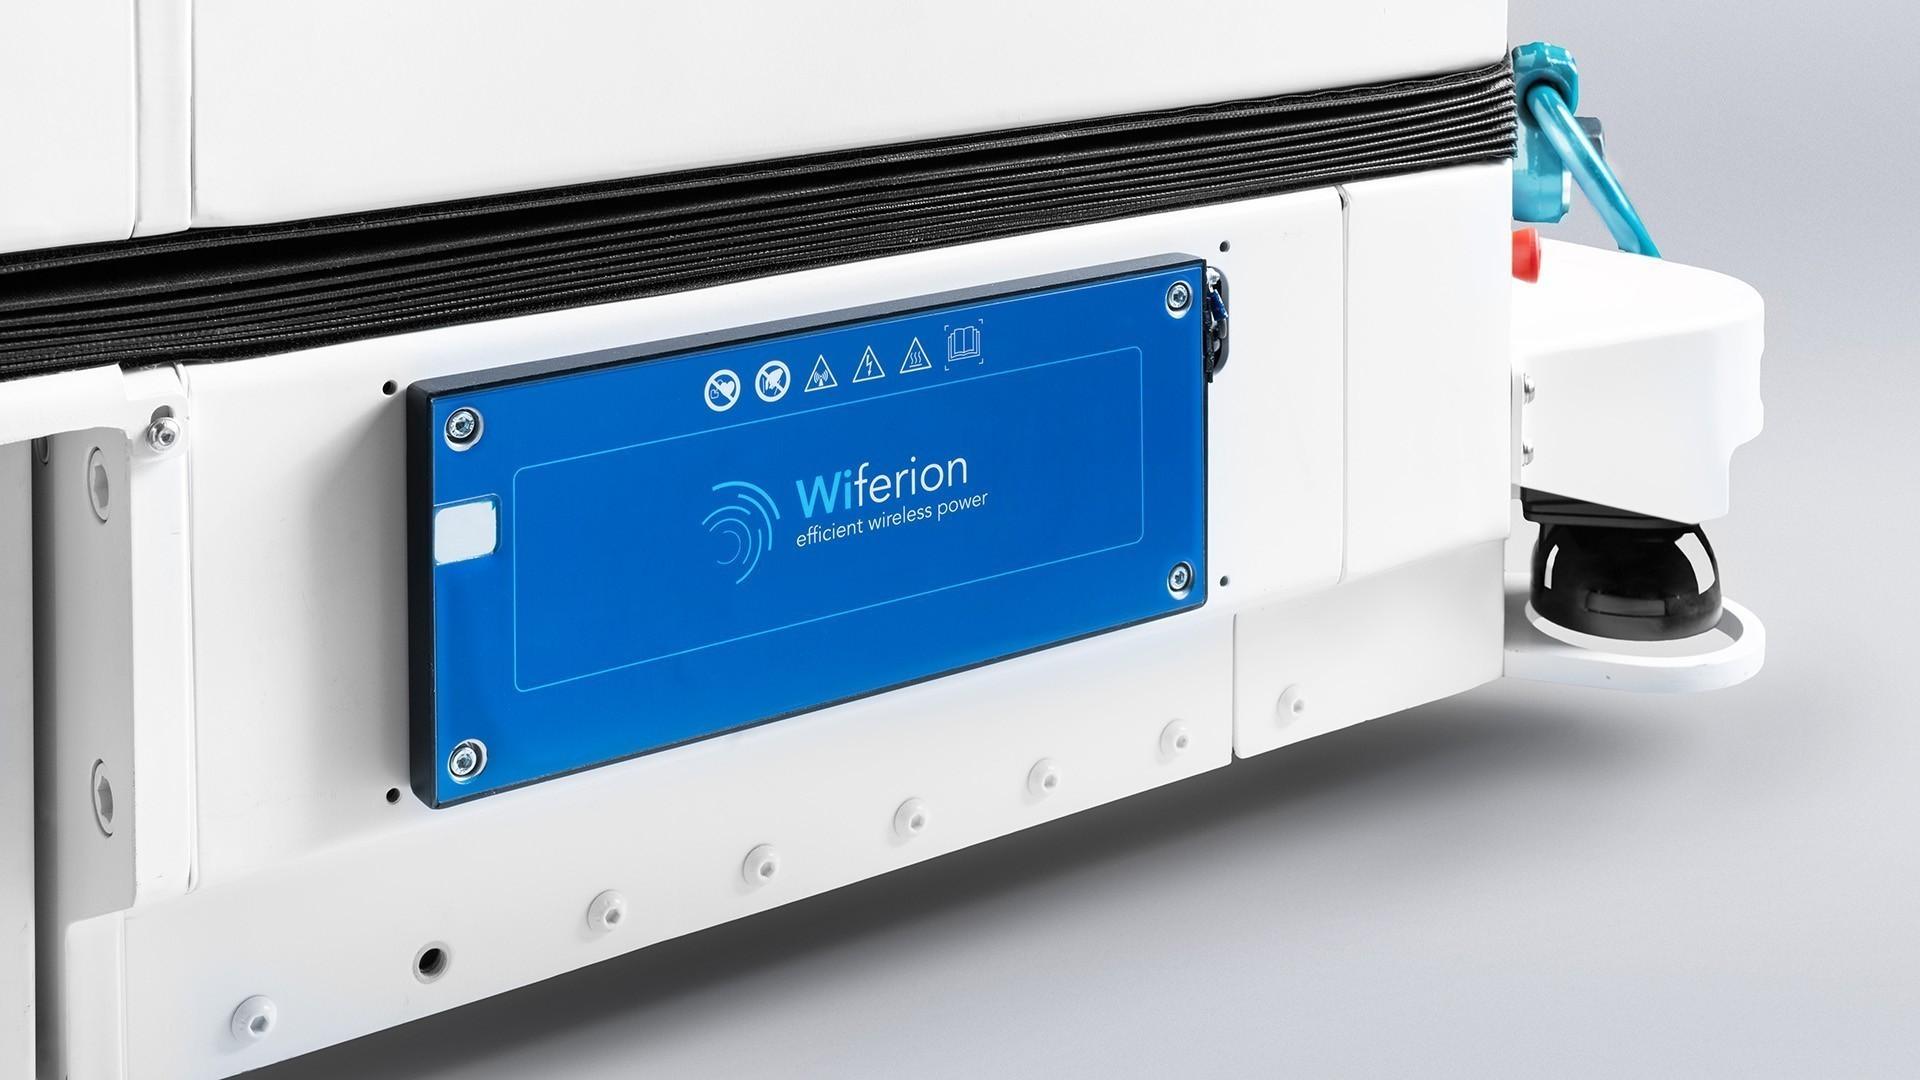 Carga inductiva agv - wiferion - stäubli WFT - etaLINK - vehículos de guiado automático